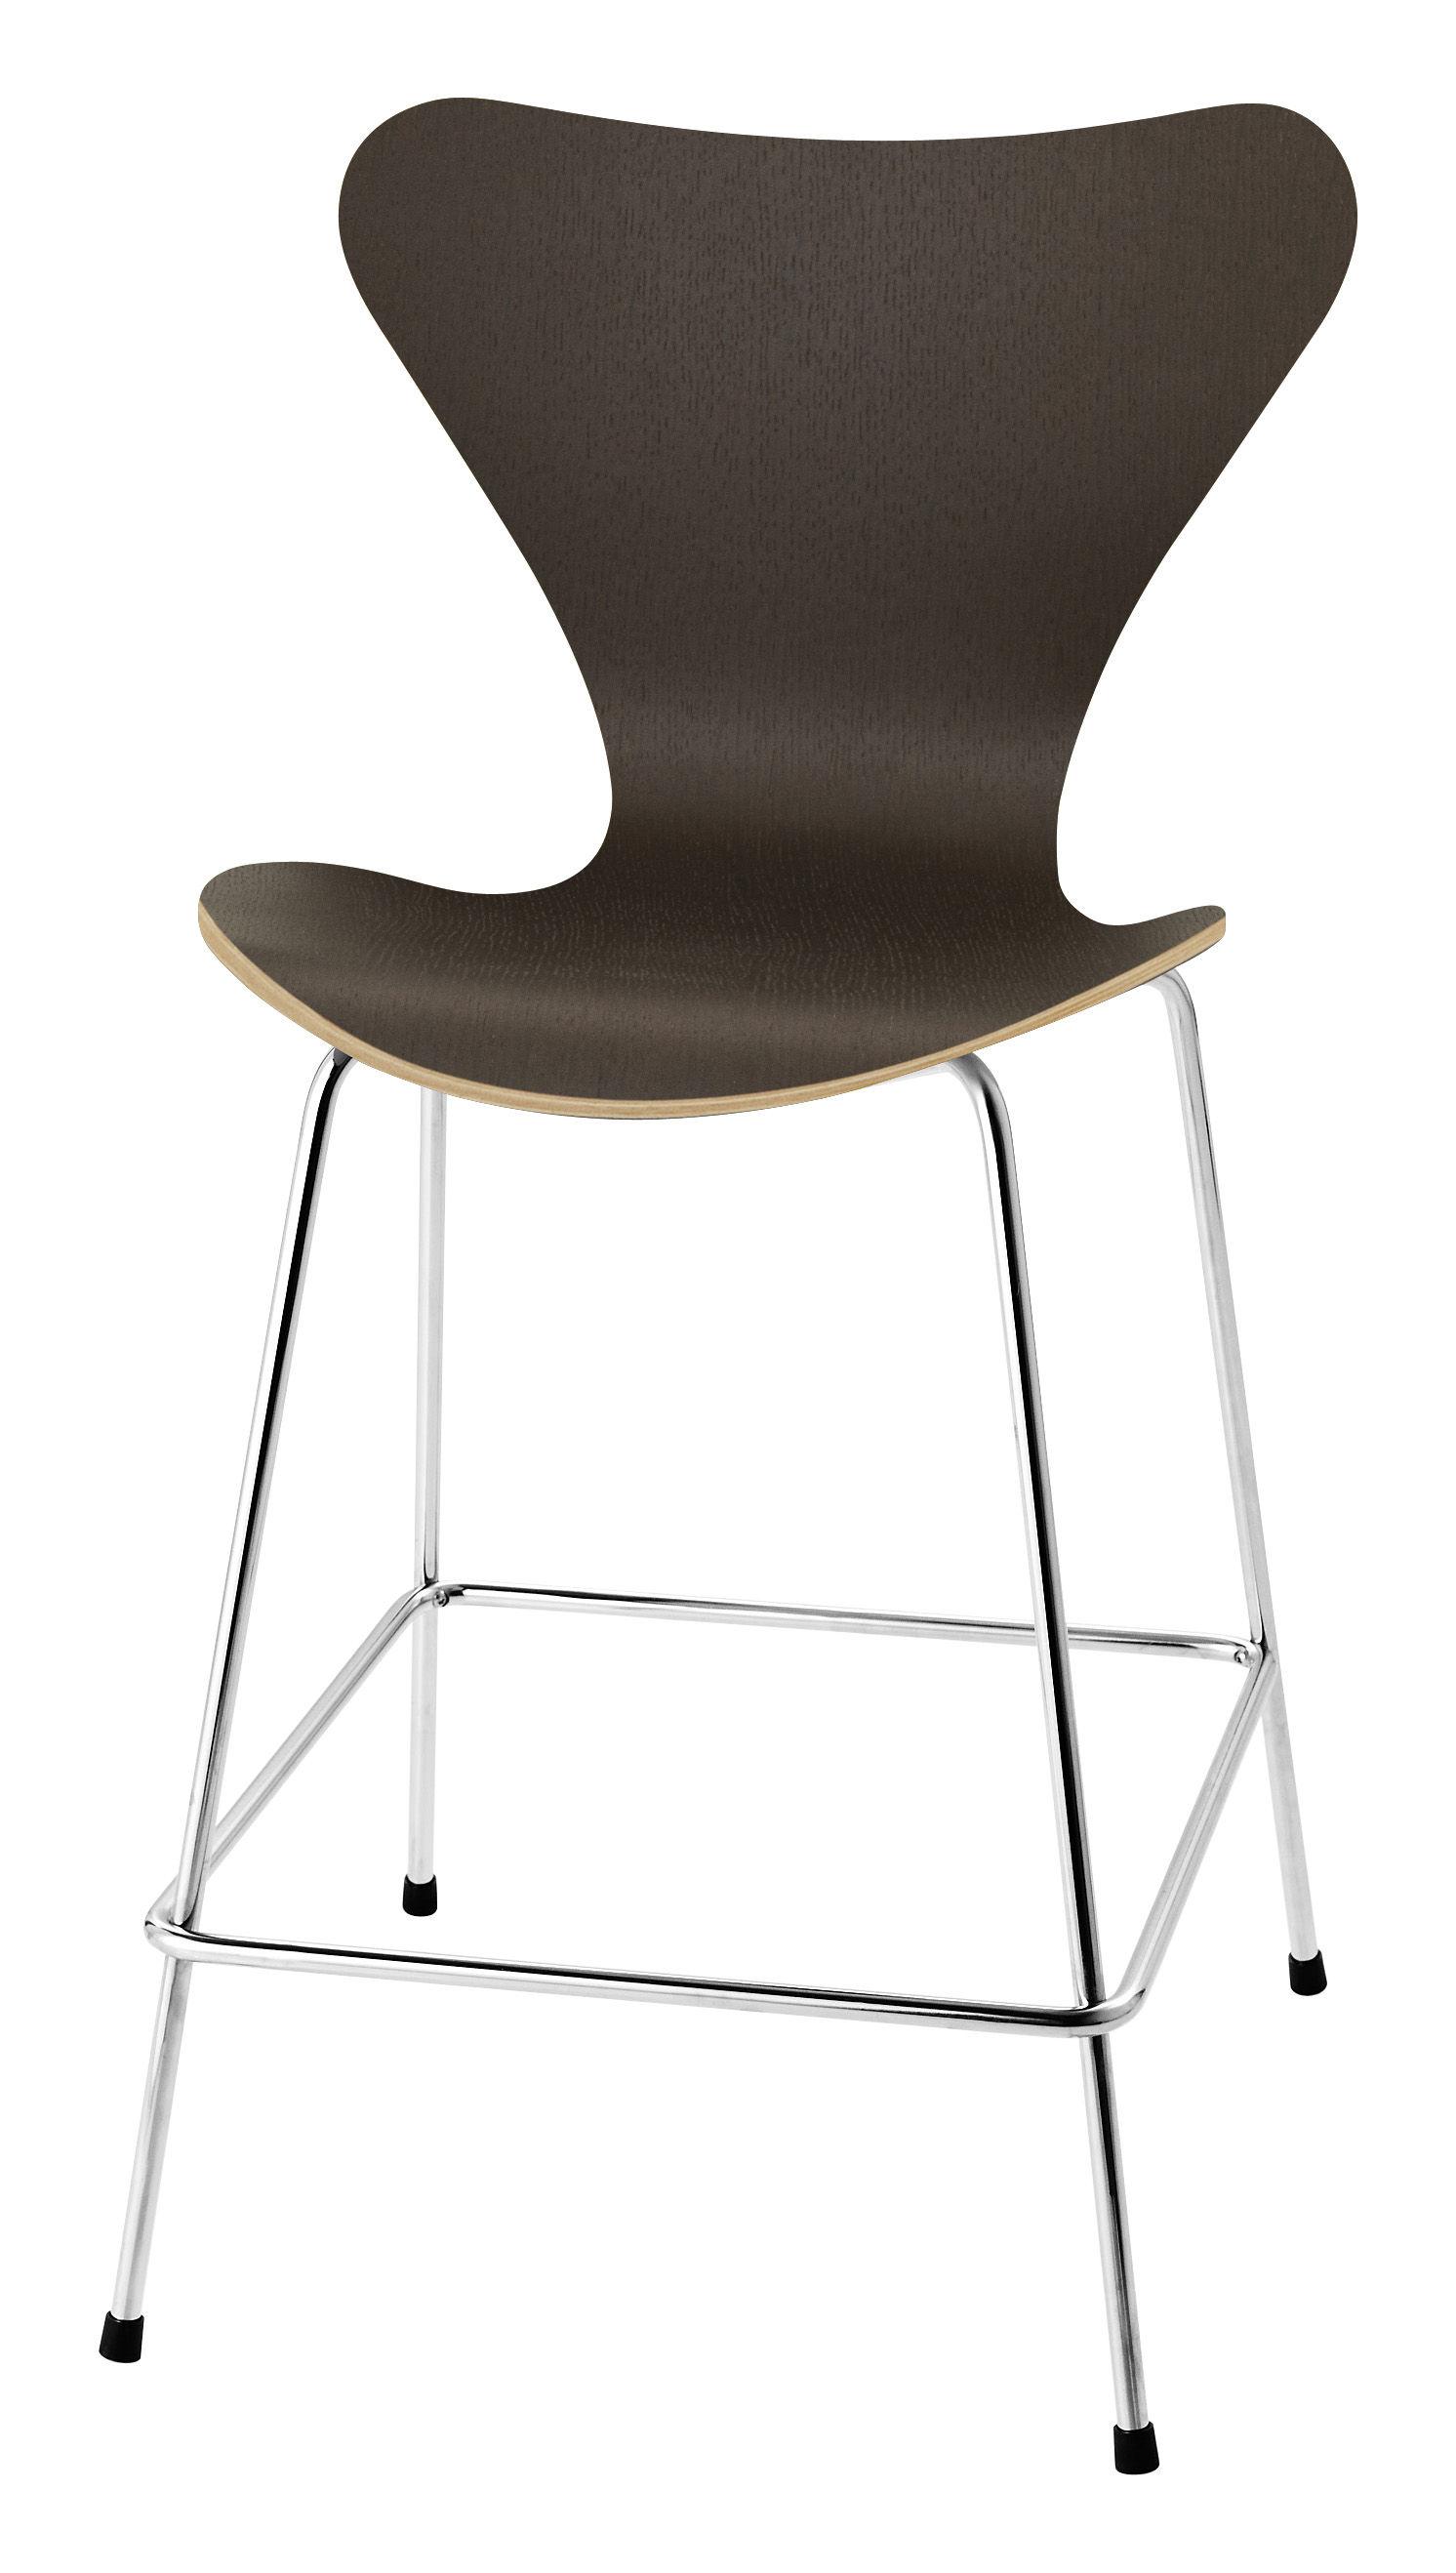 Möbel - Barhocker - Série 7 Hochstuhl H 76 cm - Holz natur - Fritz Hansen - Eiche dunkel, lackiert - Contreplaqué de chêne teinté verni, Stahl